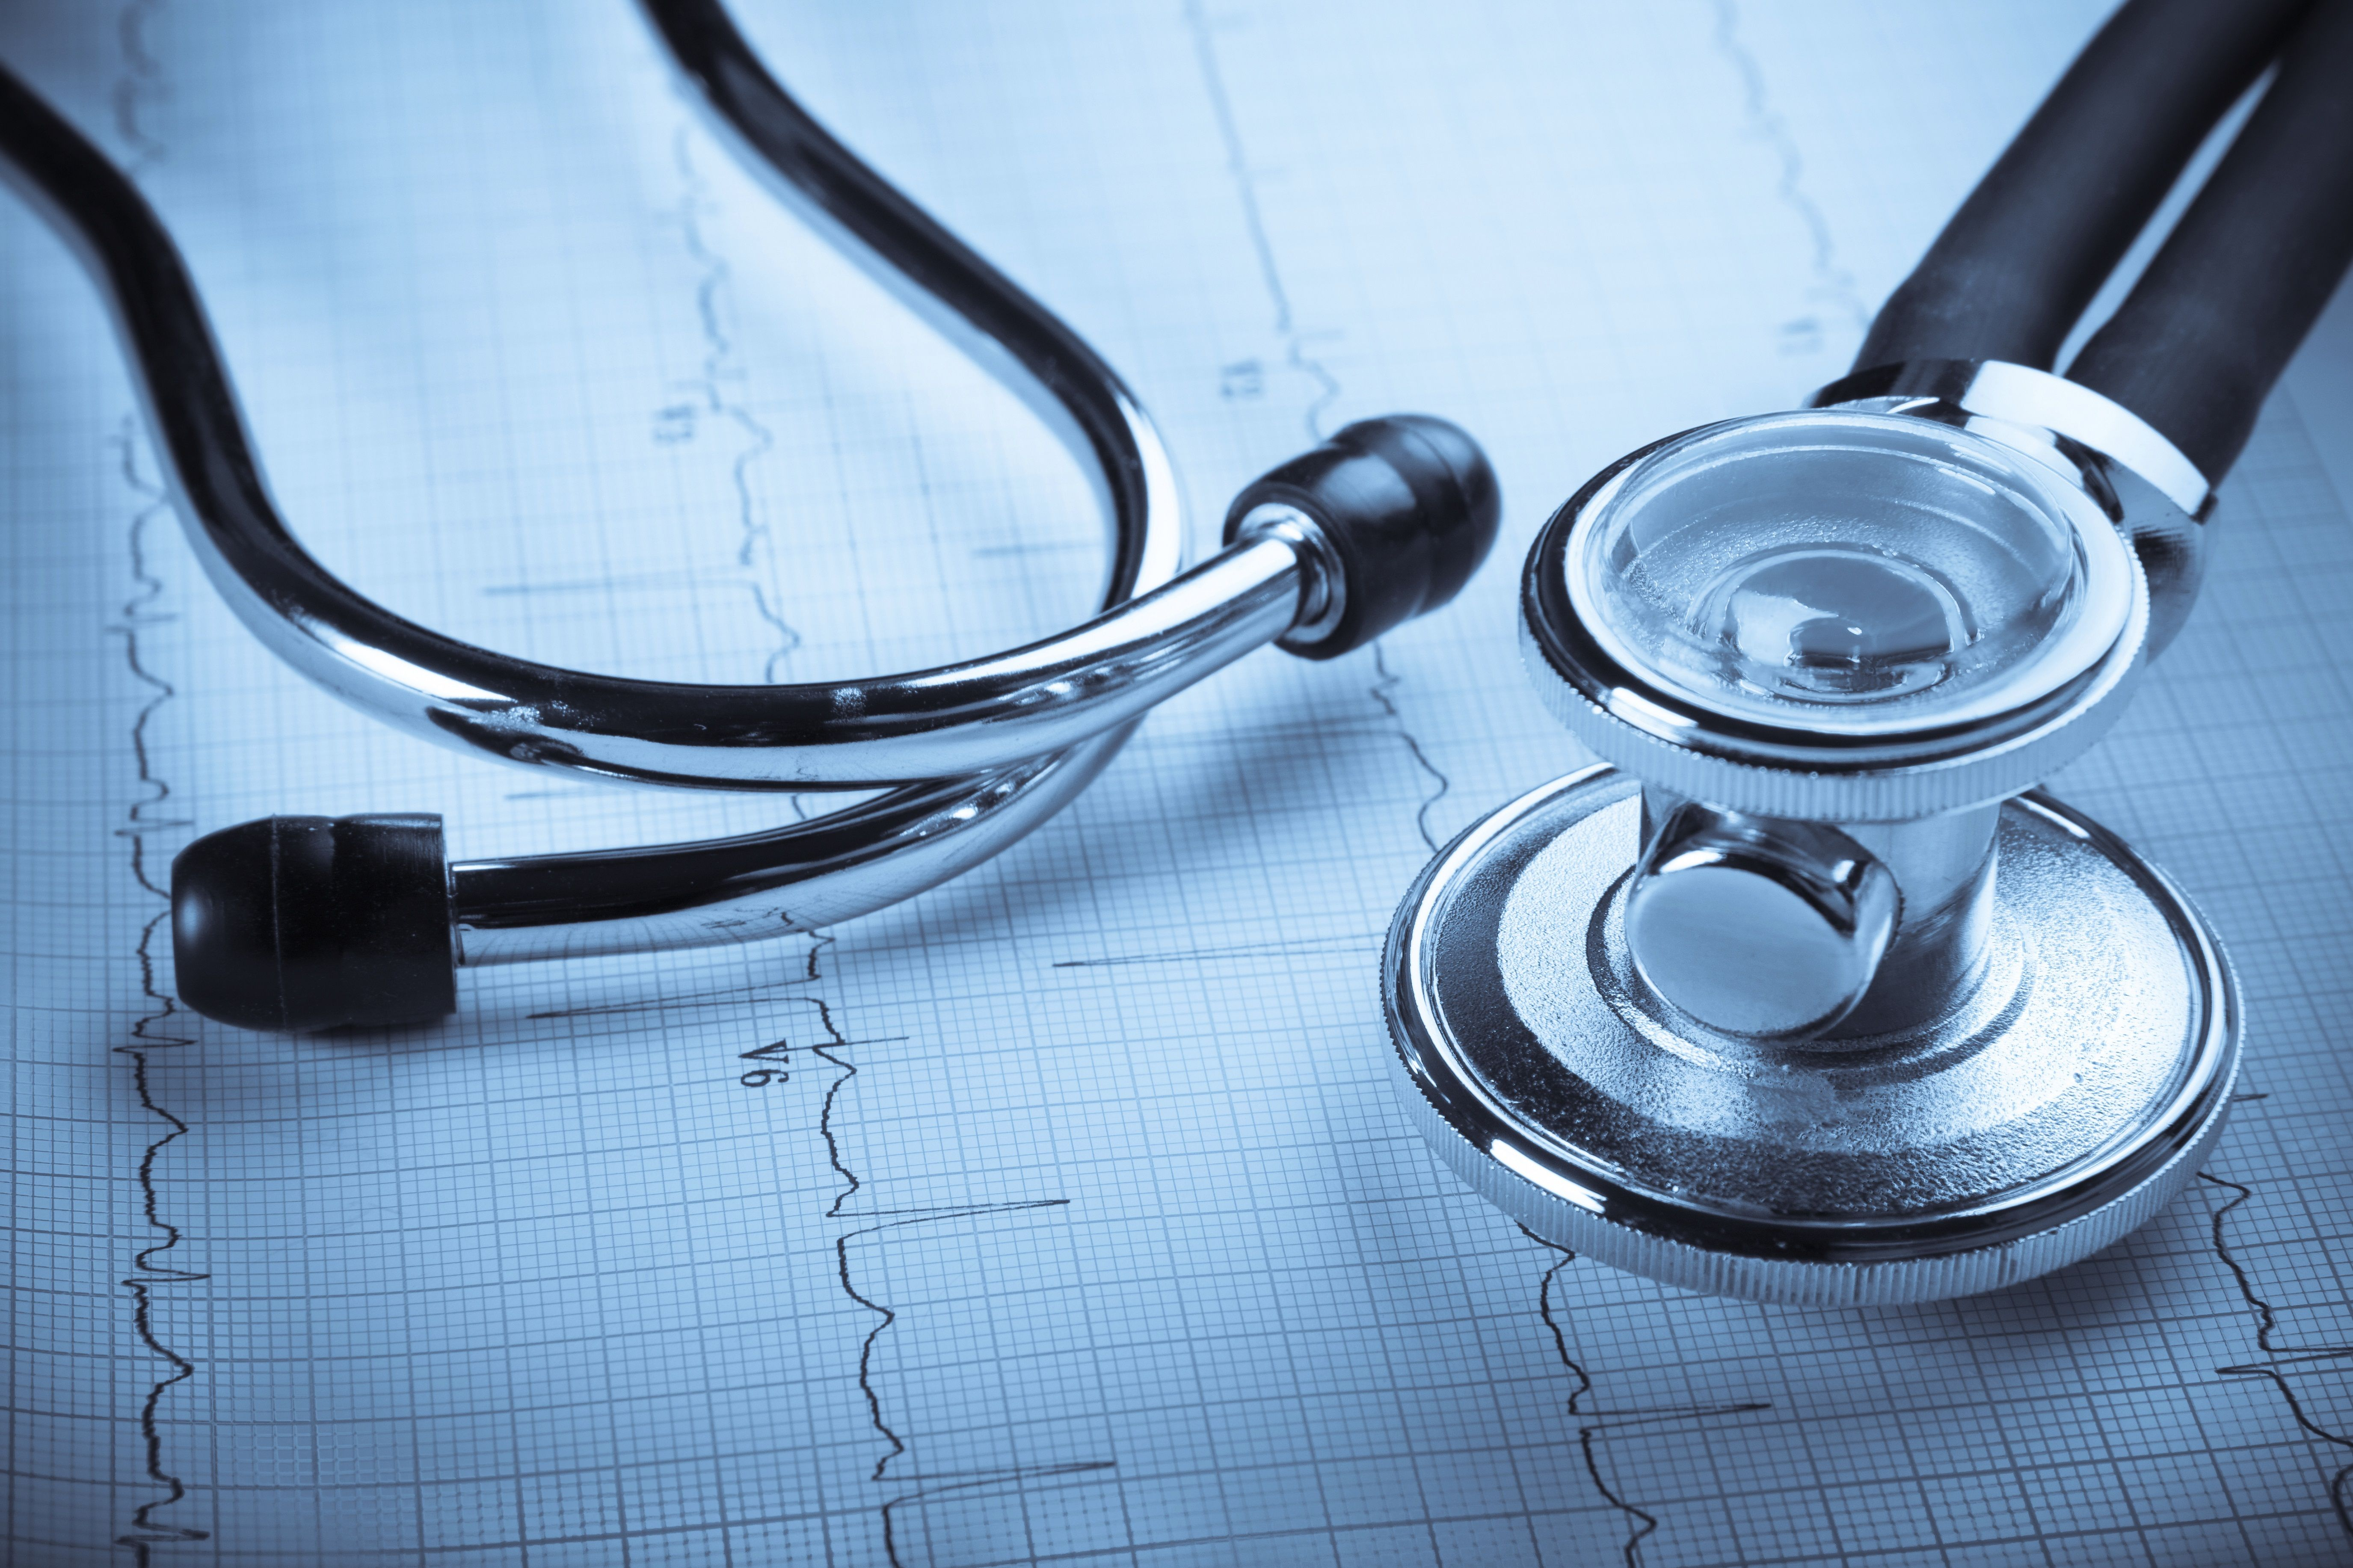 Medical Equipment HD Wallpapers   Top Medical Equipment HD 5500x3666